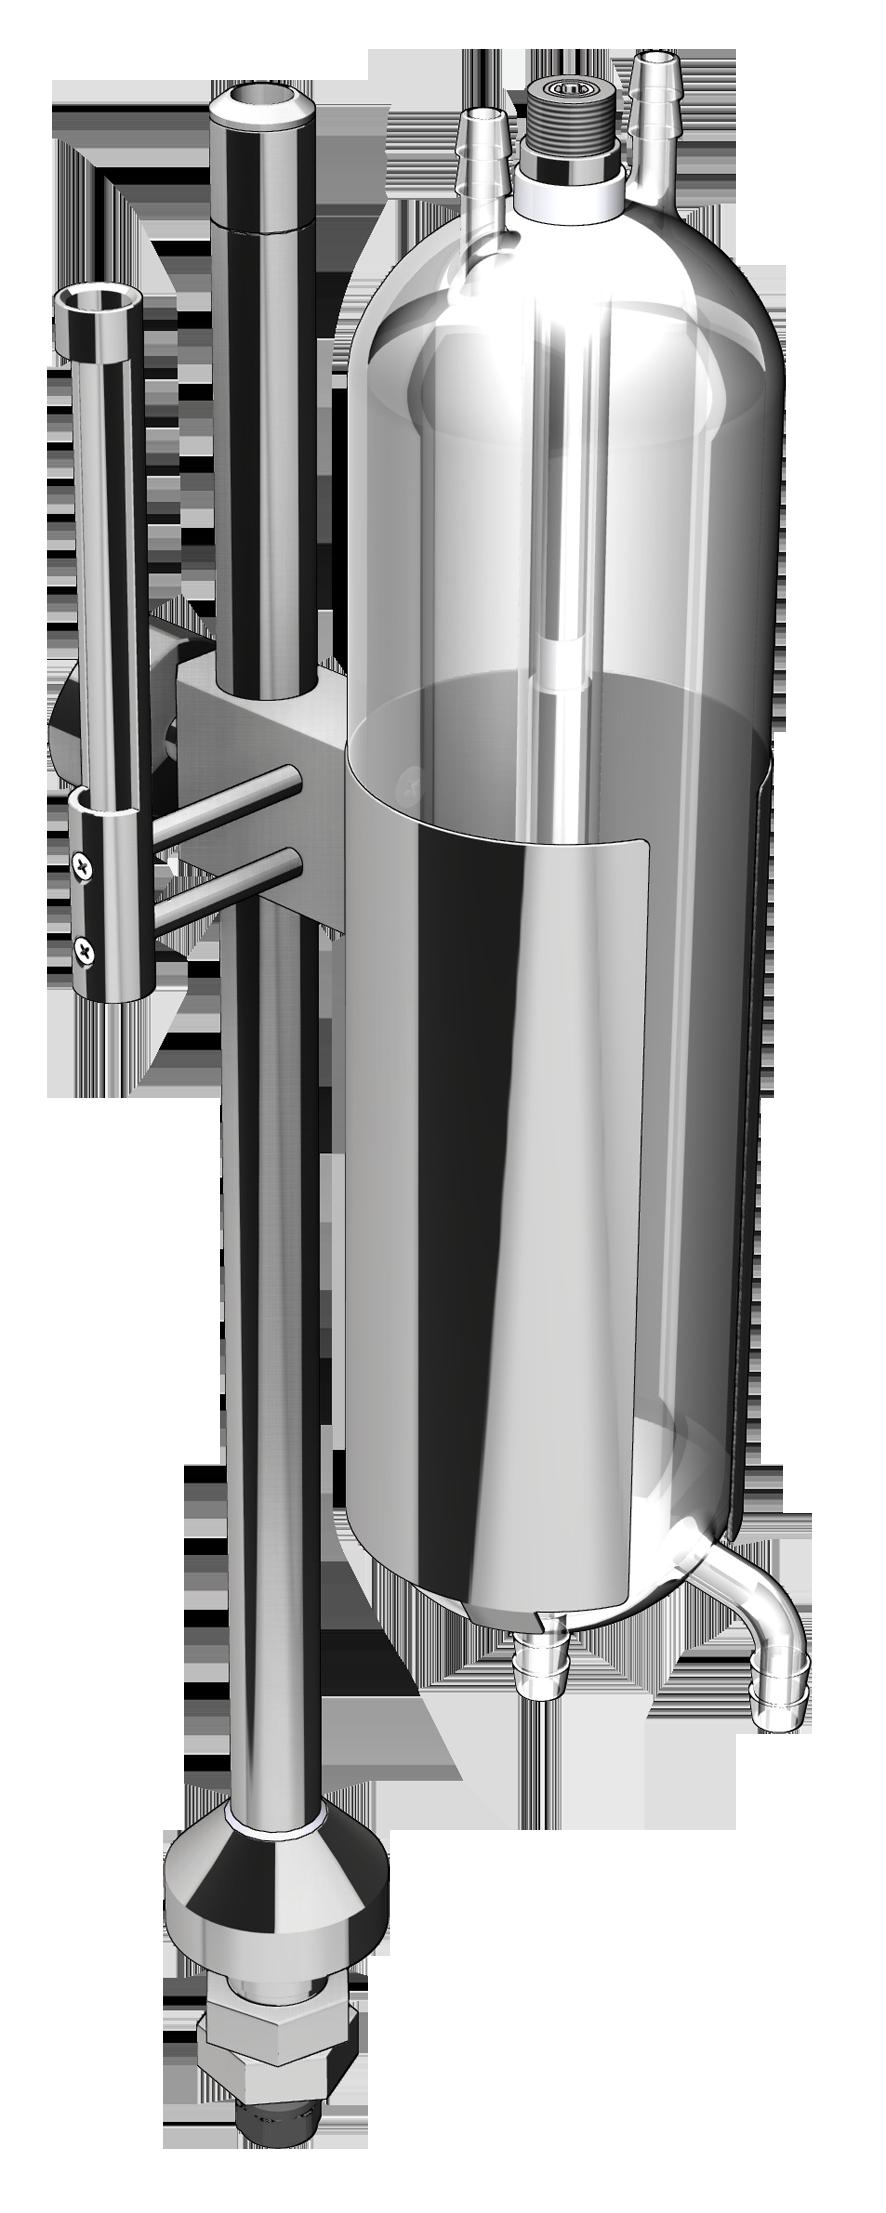 Niveaukontrollsystem Sterilabfüllung